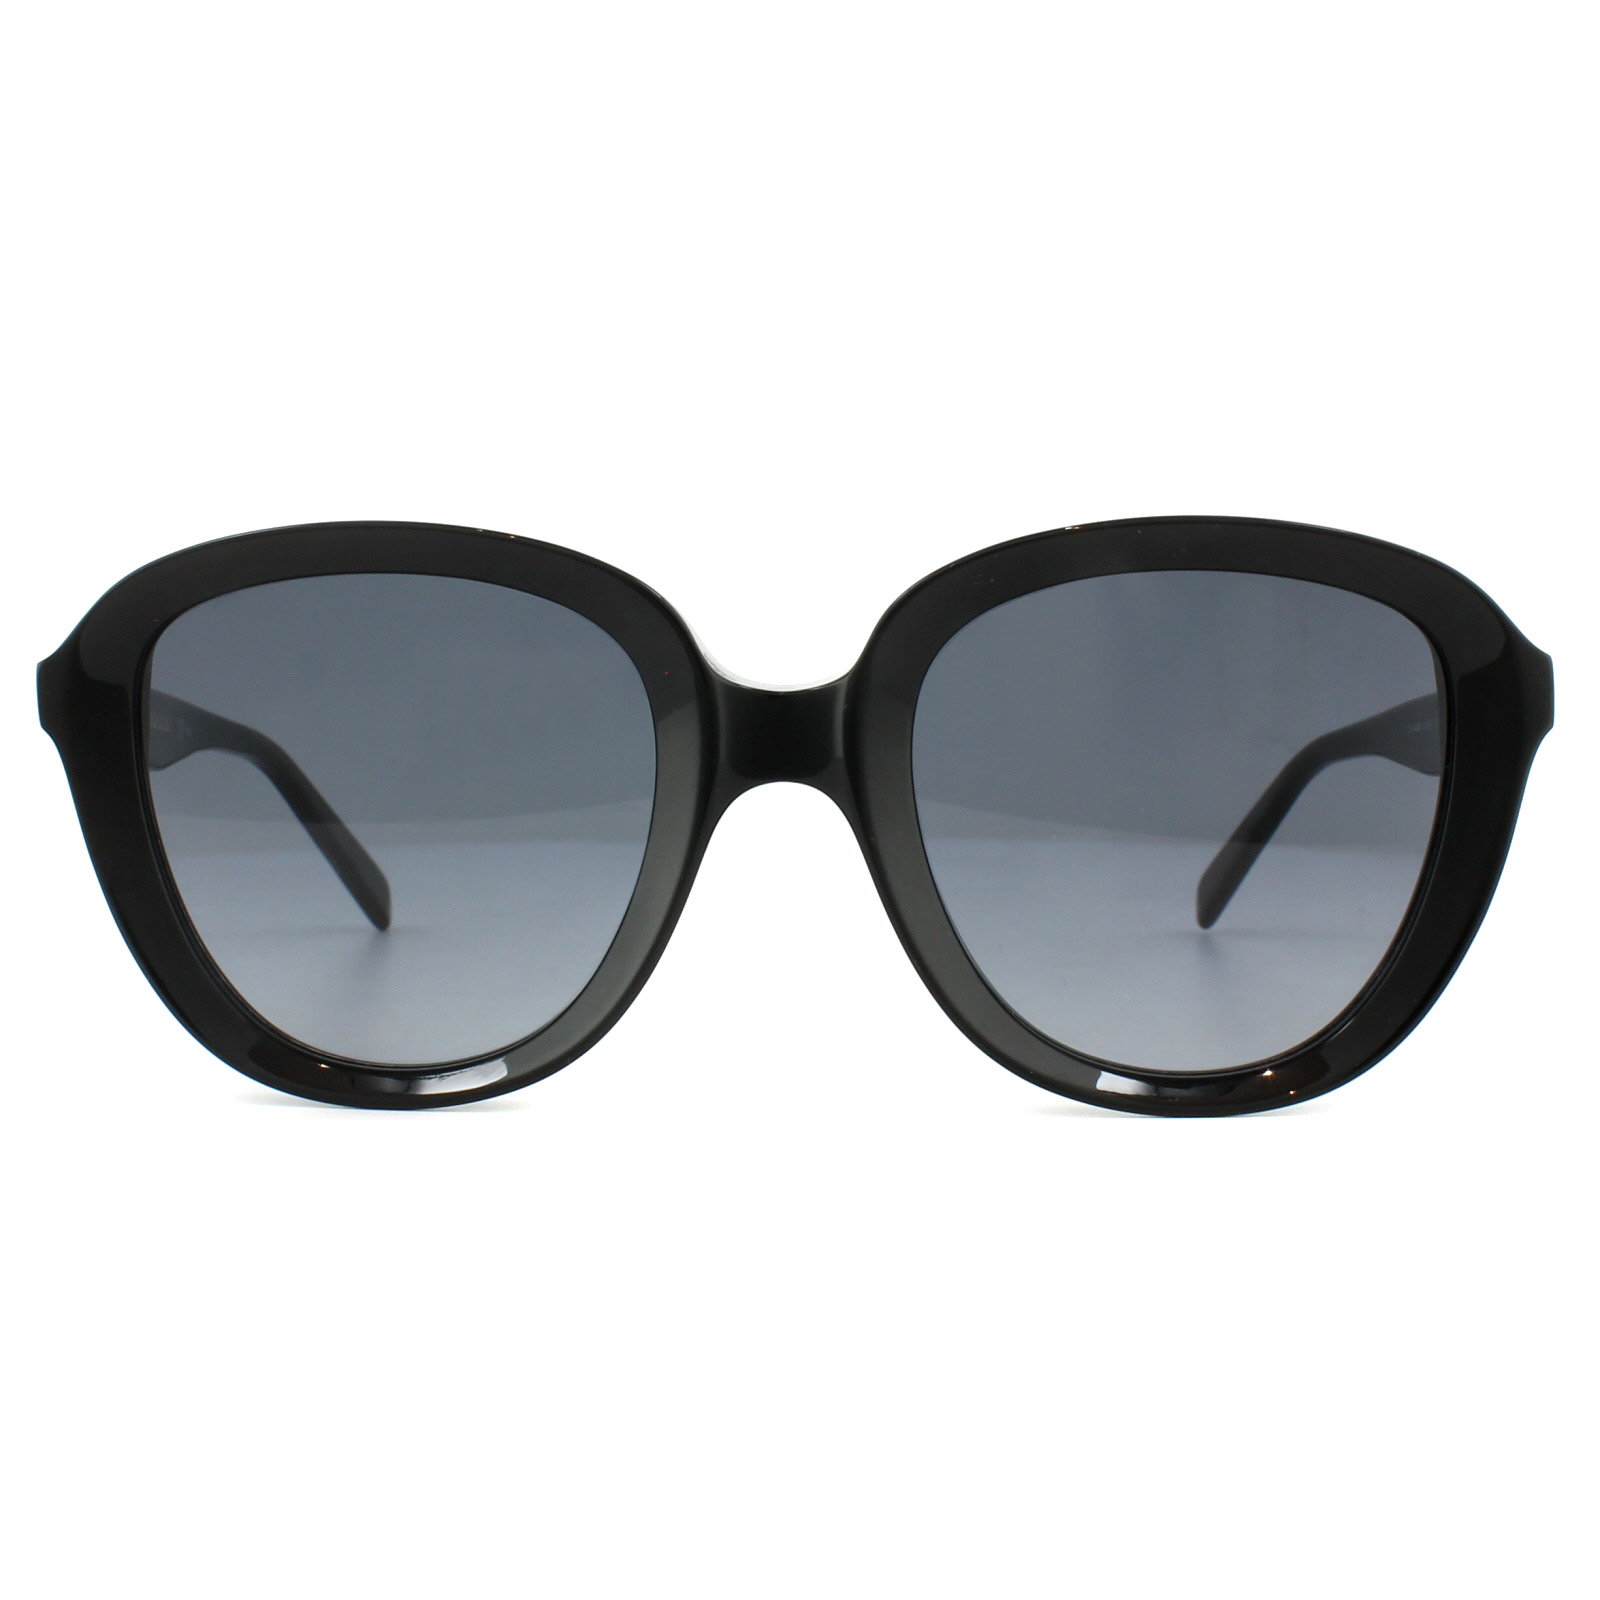 730a98c5904 Sentinel Celine Sunglasses 41448S Ava 807 9O Black Grey Gradient